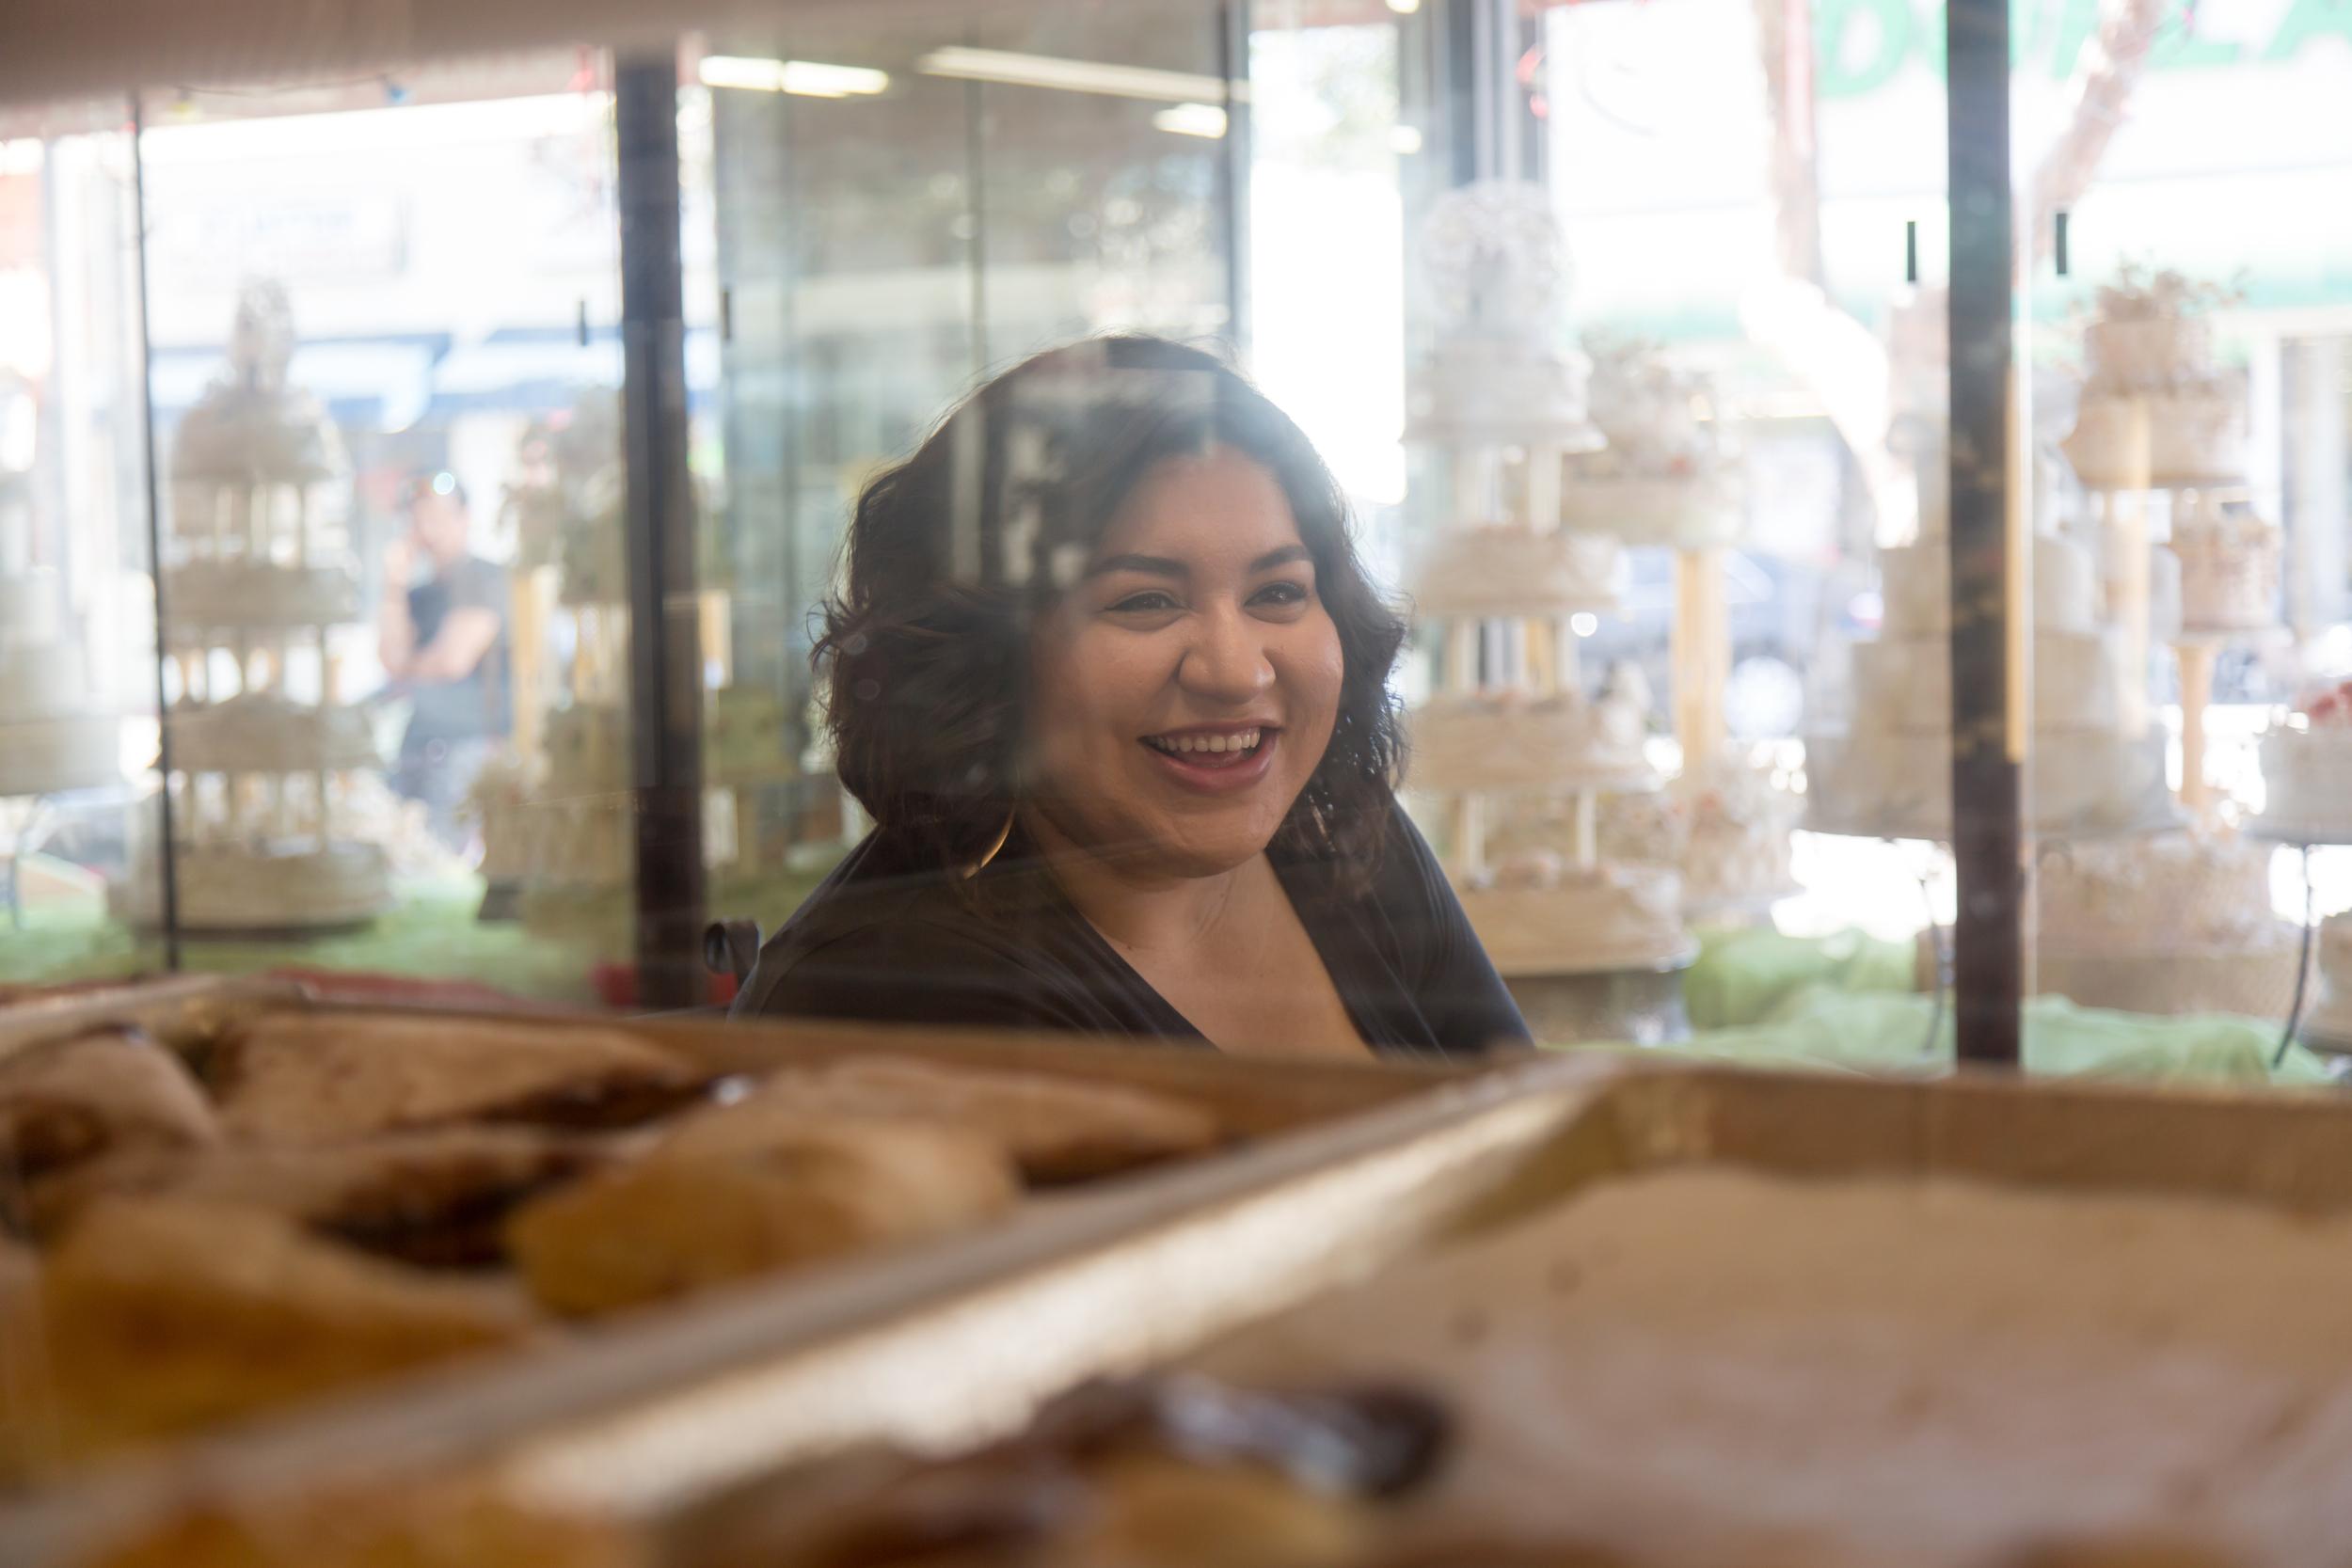 Dorenyse Diaz at El Pueblo Bakery in South Gate.